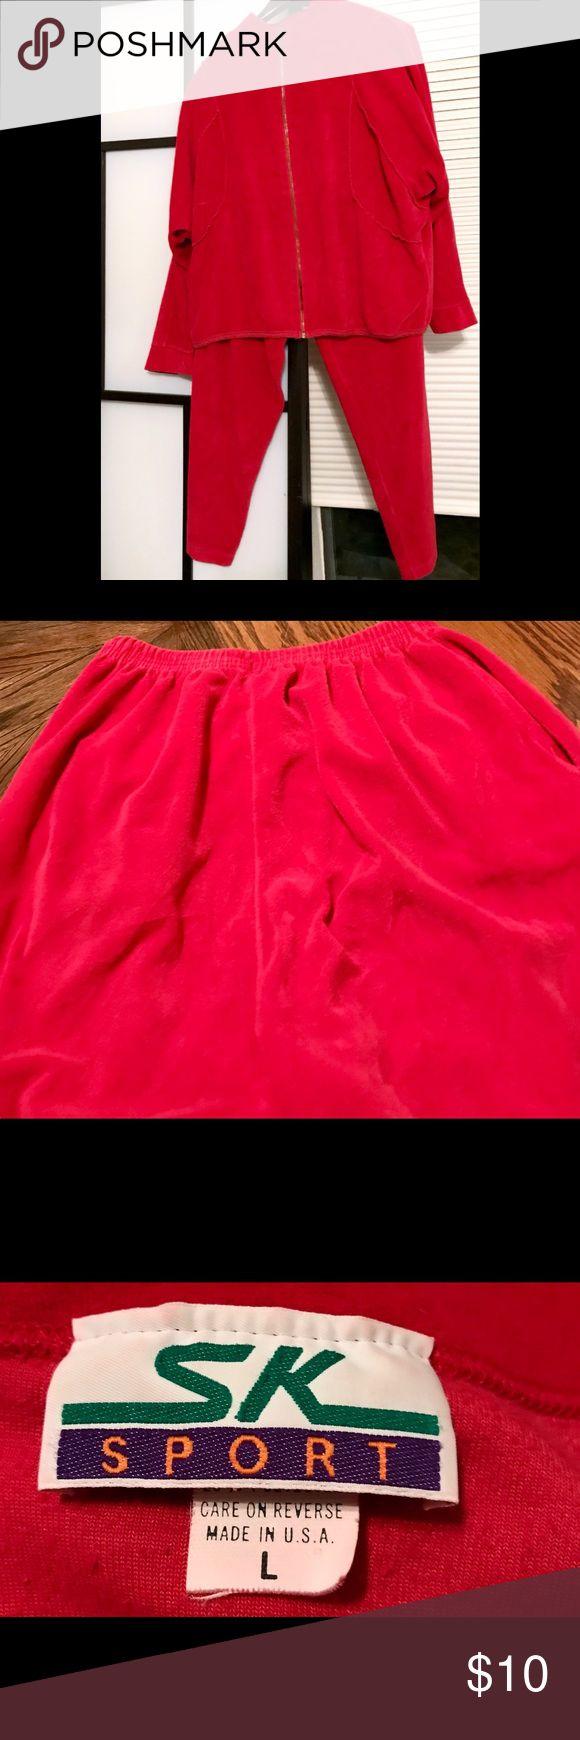 Soft jogging suit ❤️ Euc zippered jogging suit with elastic waist pants - with pant pockets 😊 sk sport Pants Track Pants & Joggers